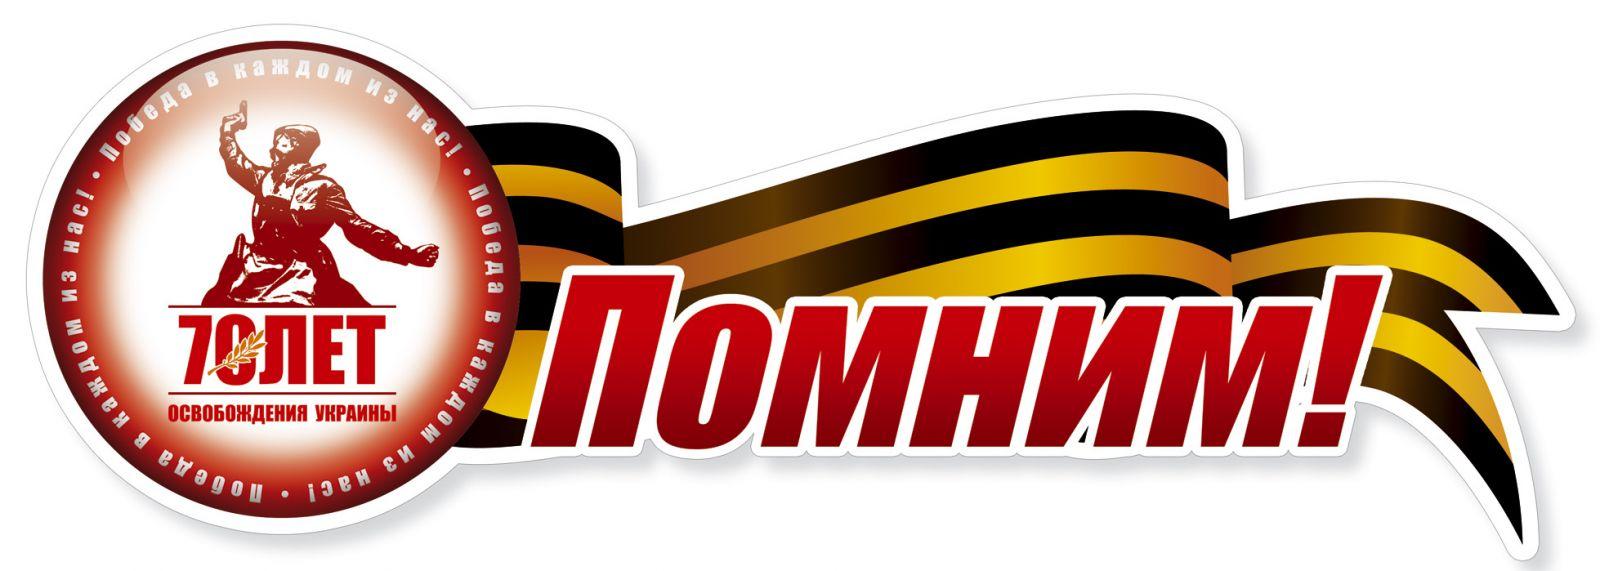 http://bal-ds2.edumsko.ru/images/users-files/bal-ds2/70_let_nakleka.jpg